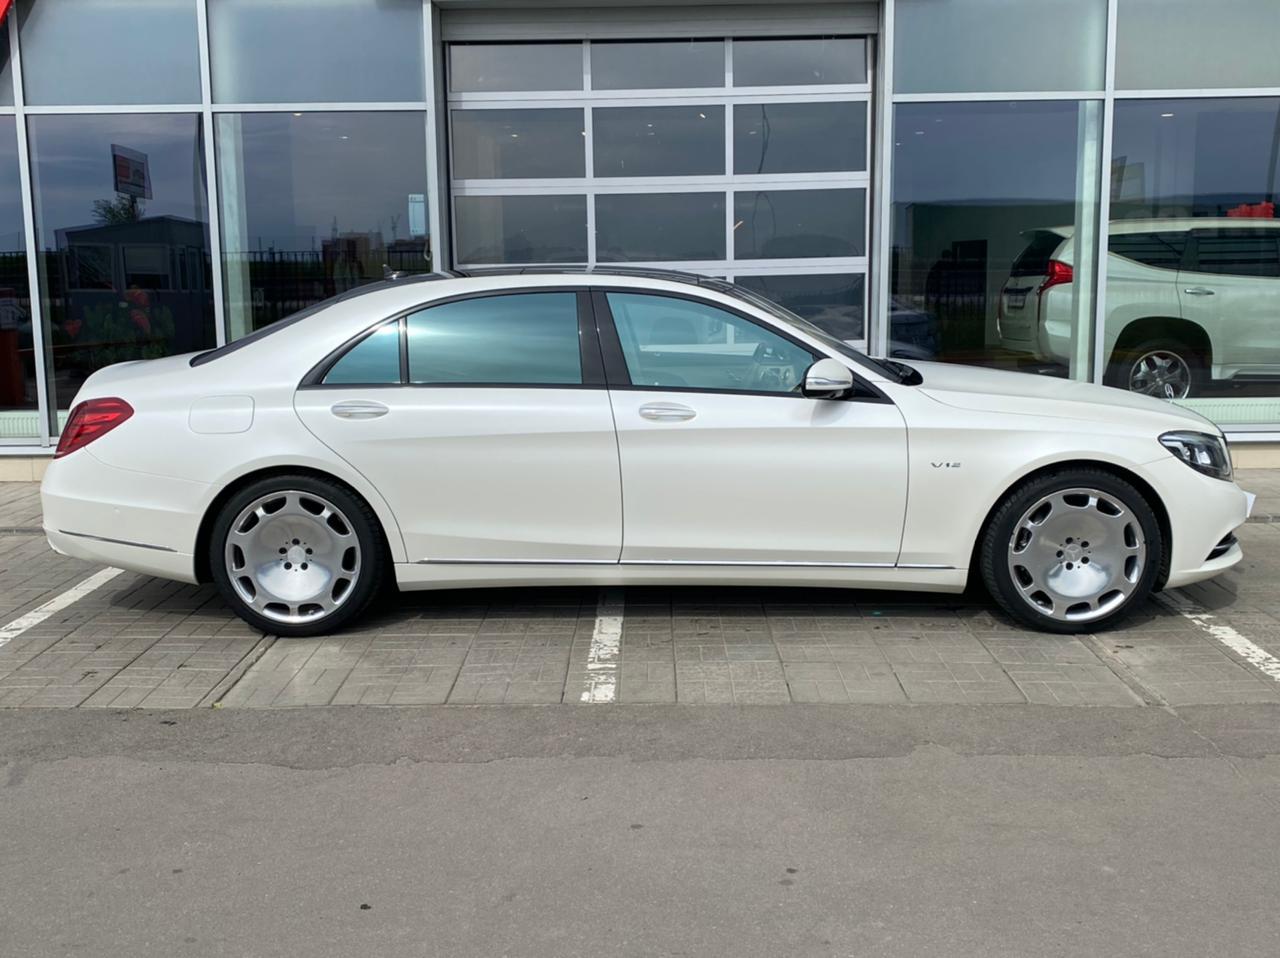 Mercedes-Benz | S-Класс, VI (W222, C217)